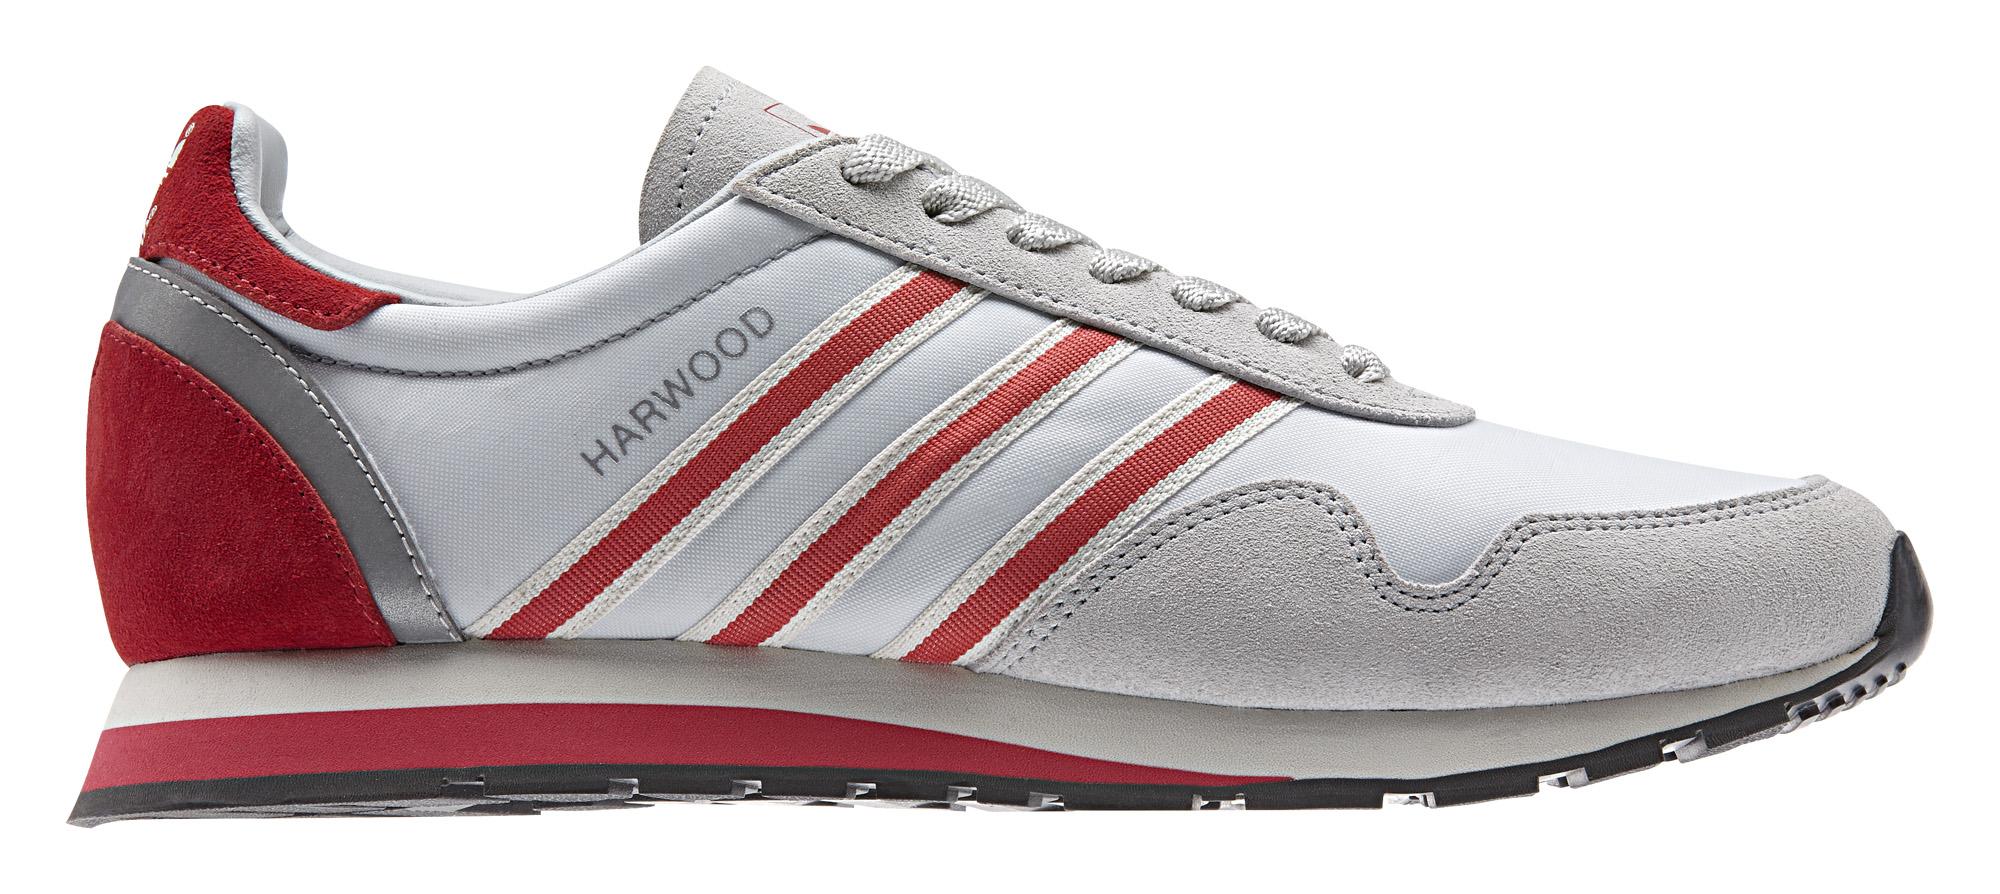 Adidas Spezial Hardwood Profile